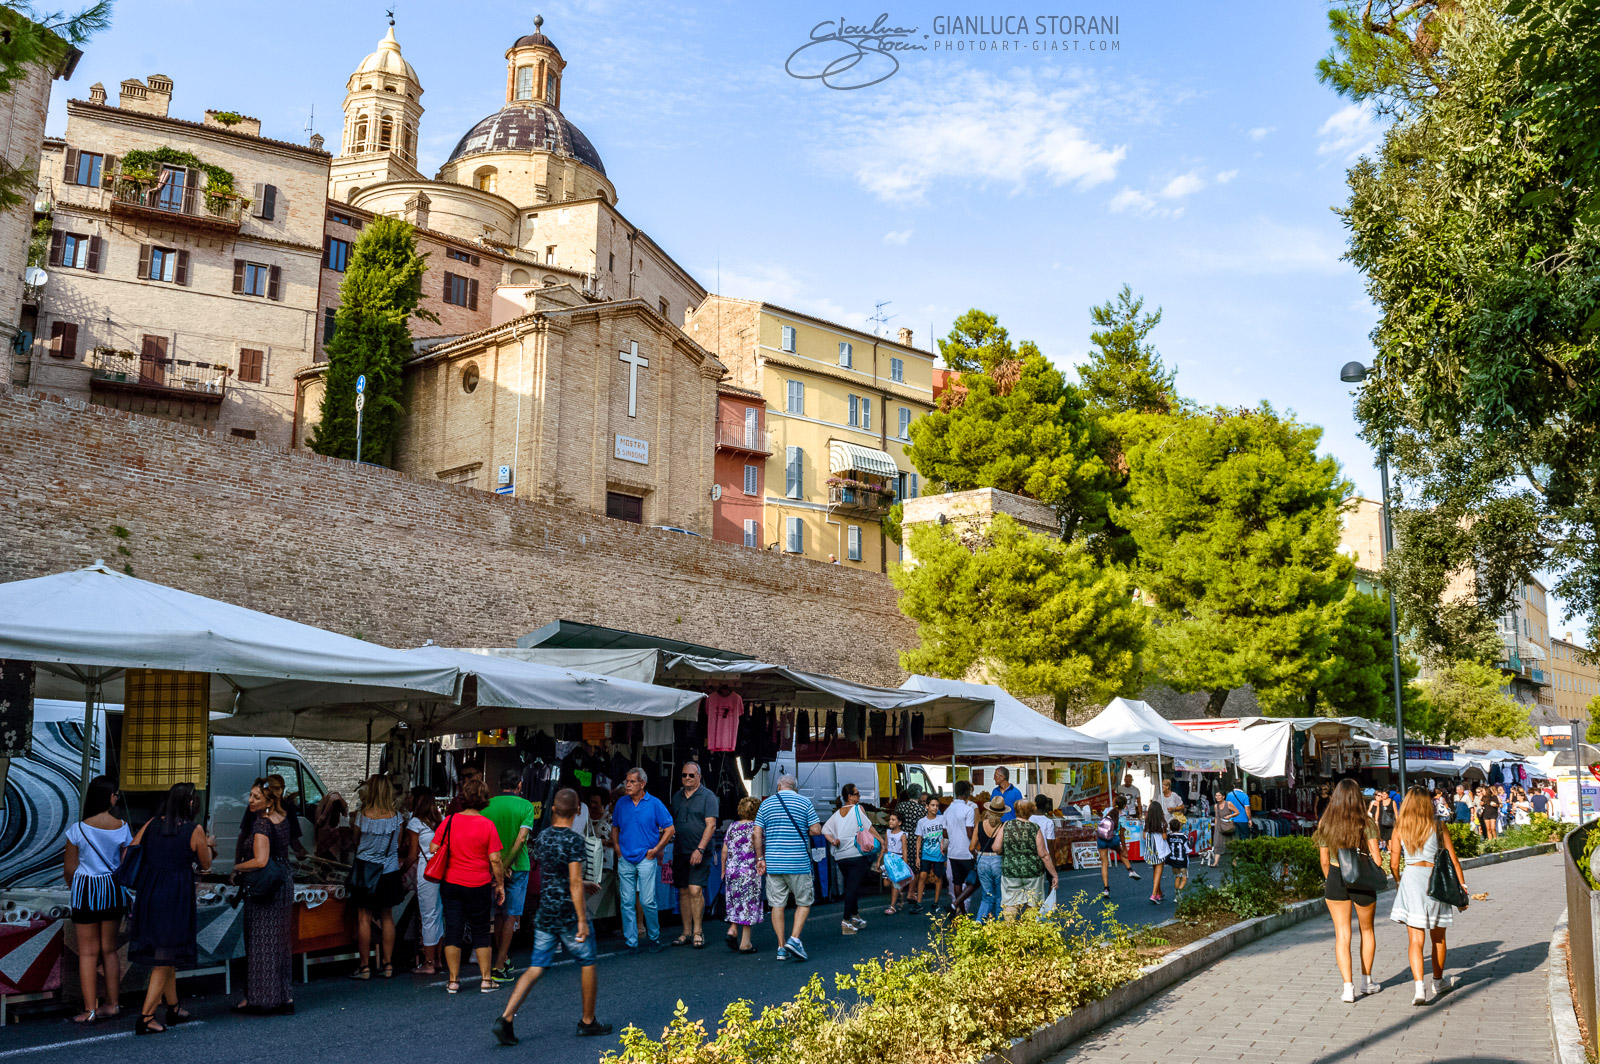 San Giuliano 2017, Viale Trieste - Gianluca Storani Photo Art  (ID: 4-2482)